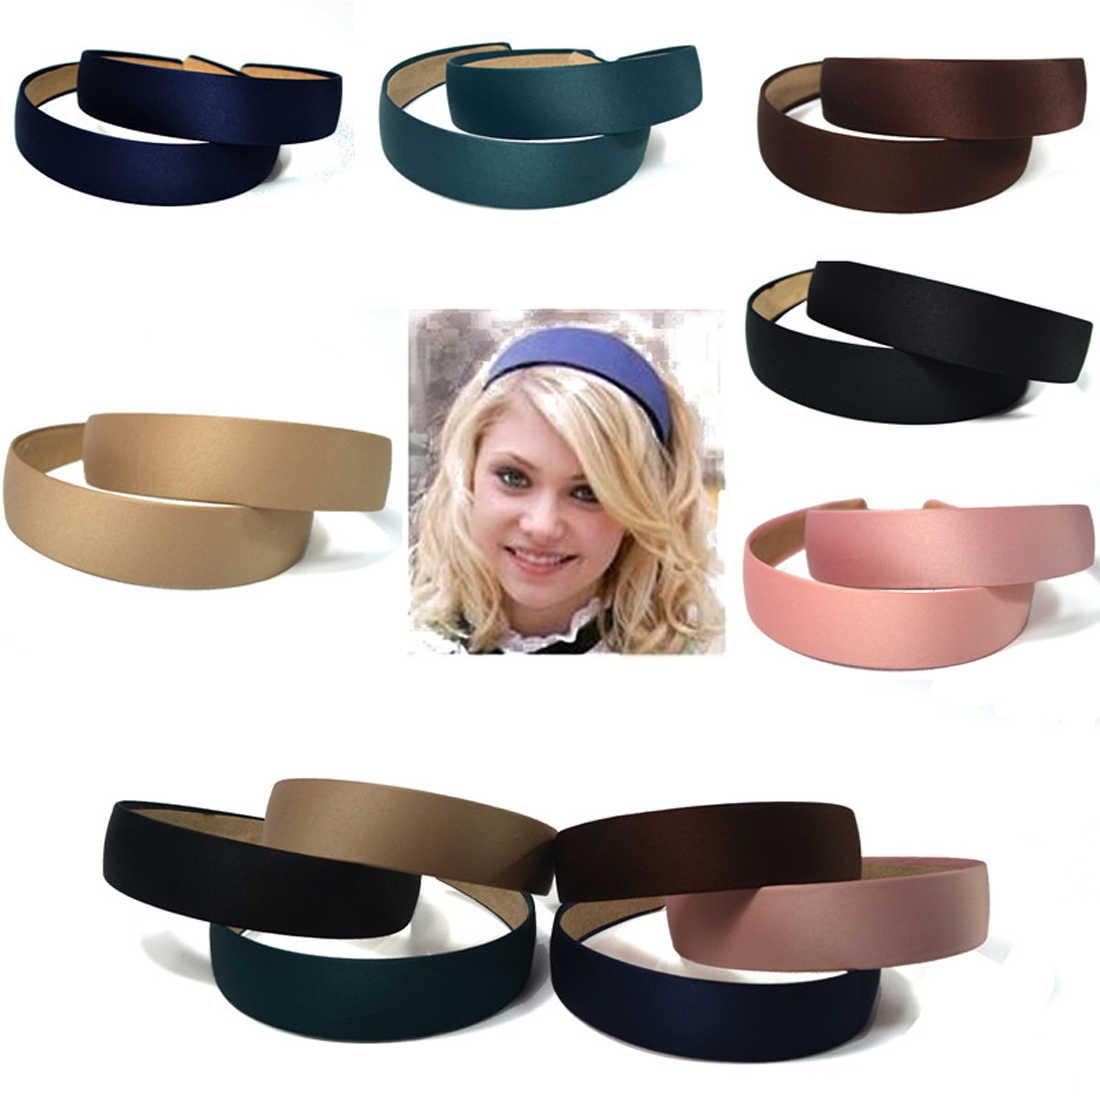 Wanita Perempuan Gadis Lebar Kanvas Headband Rambut Band Hiasan Kepala Rambut Band Boutique Rambut Hoops untuk Perhiasan Tiara Rambut Aksesoris